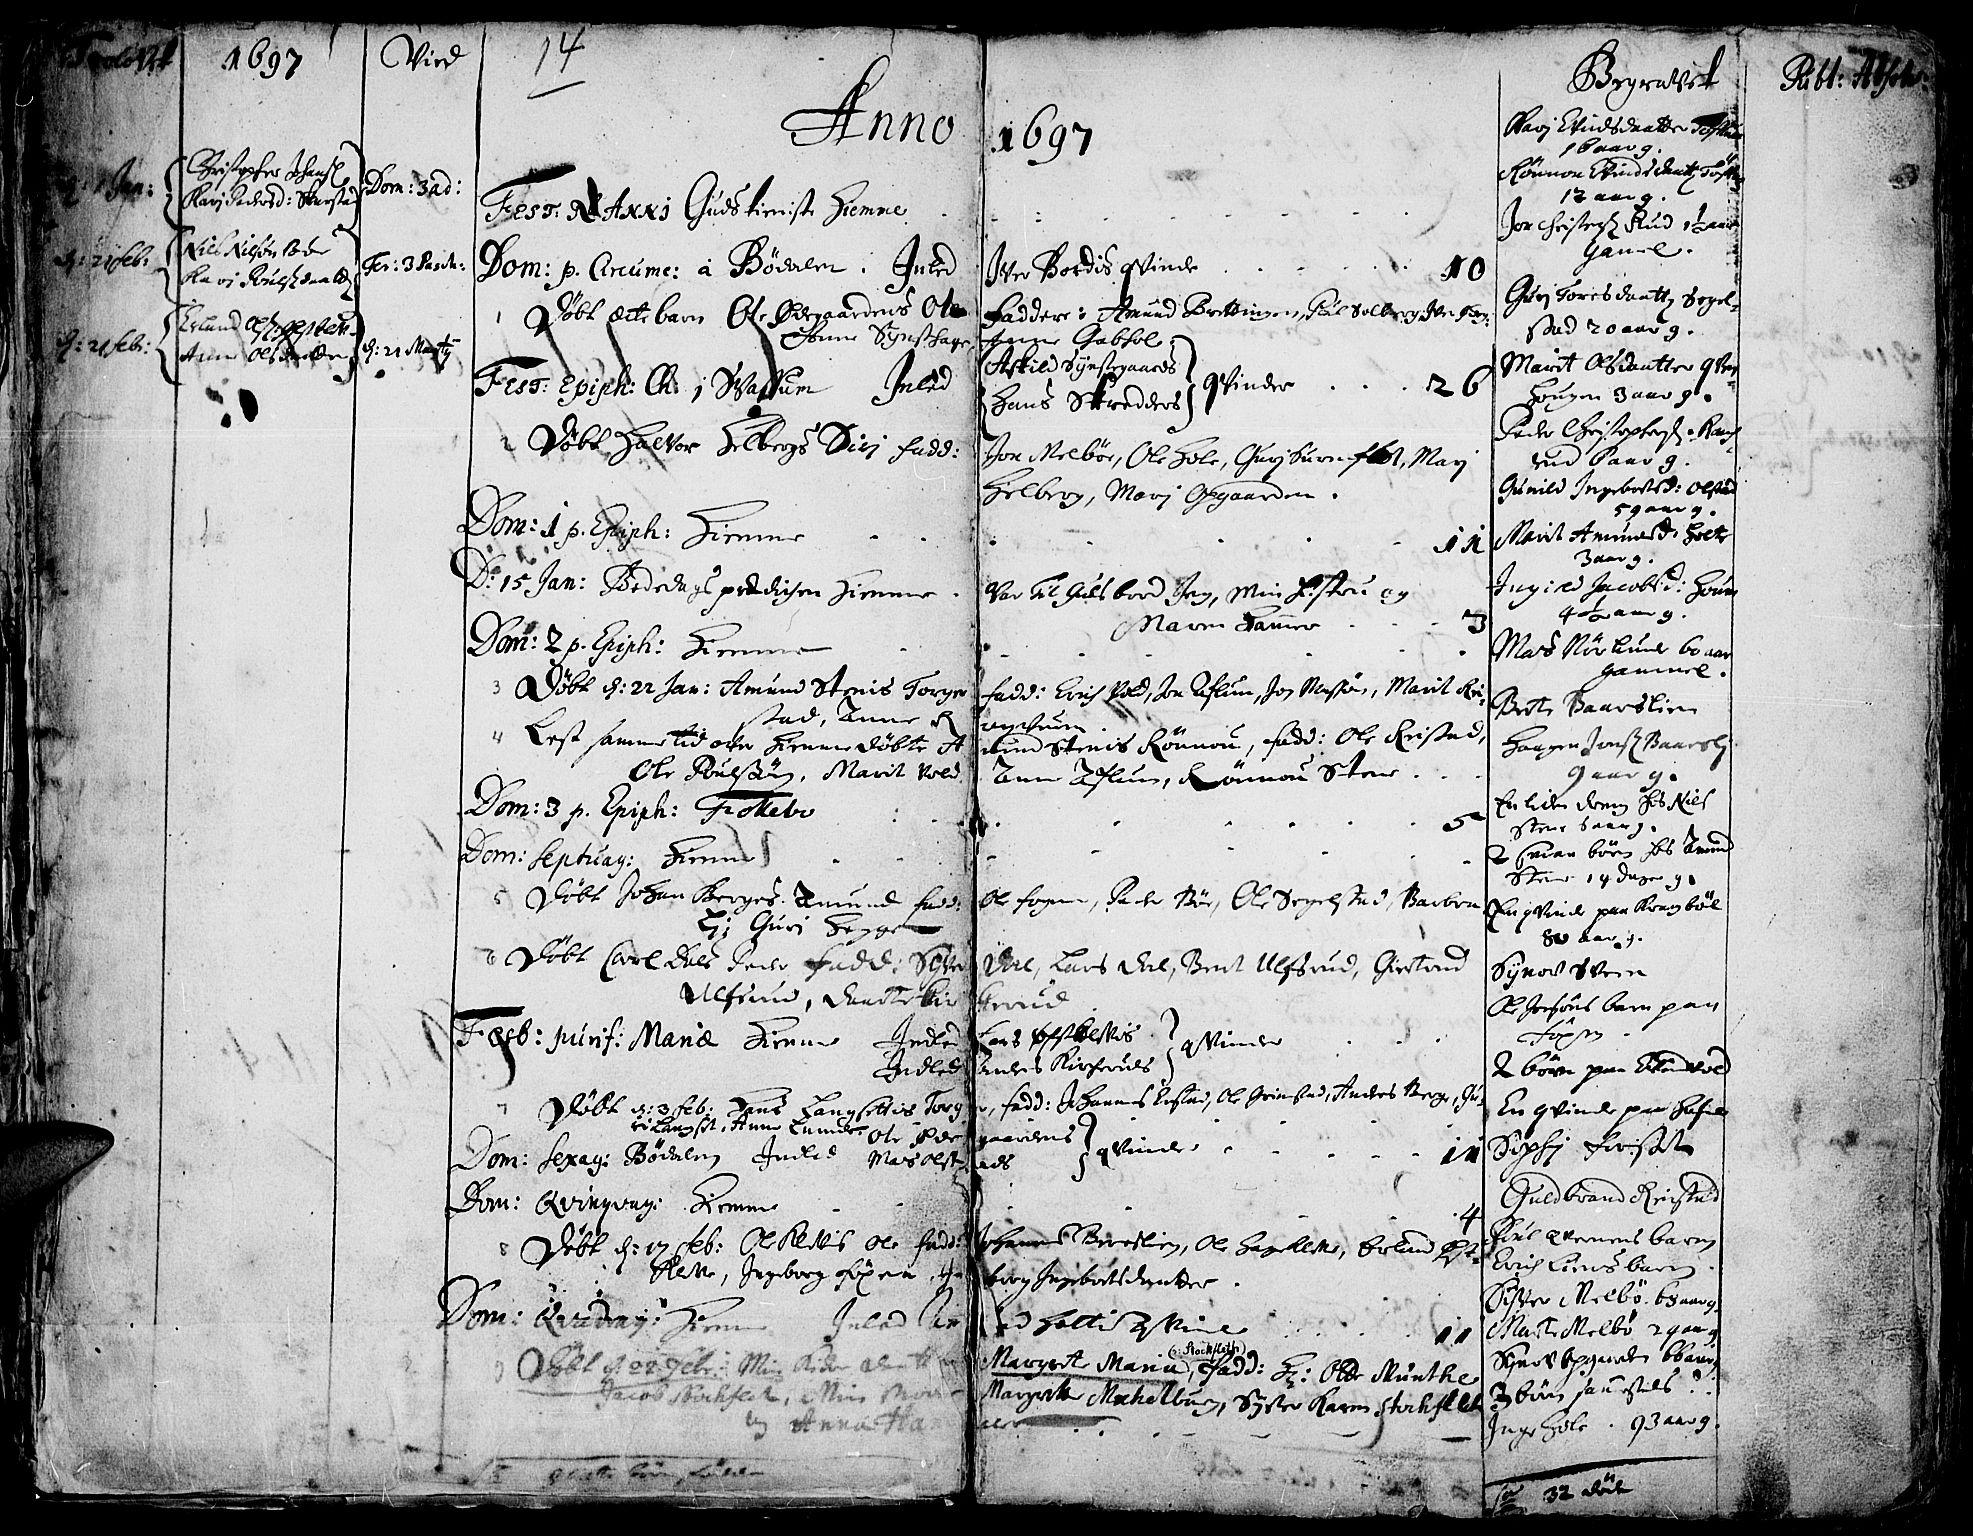 SAH, Gausdal prestekontor, Ministerialbok nr. 1, 1693-1728, s. 14